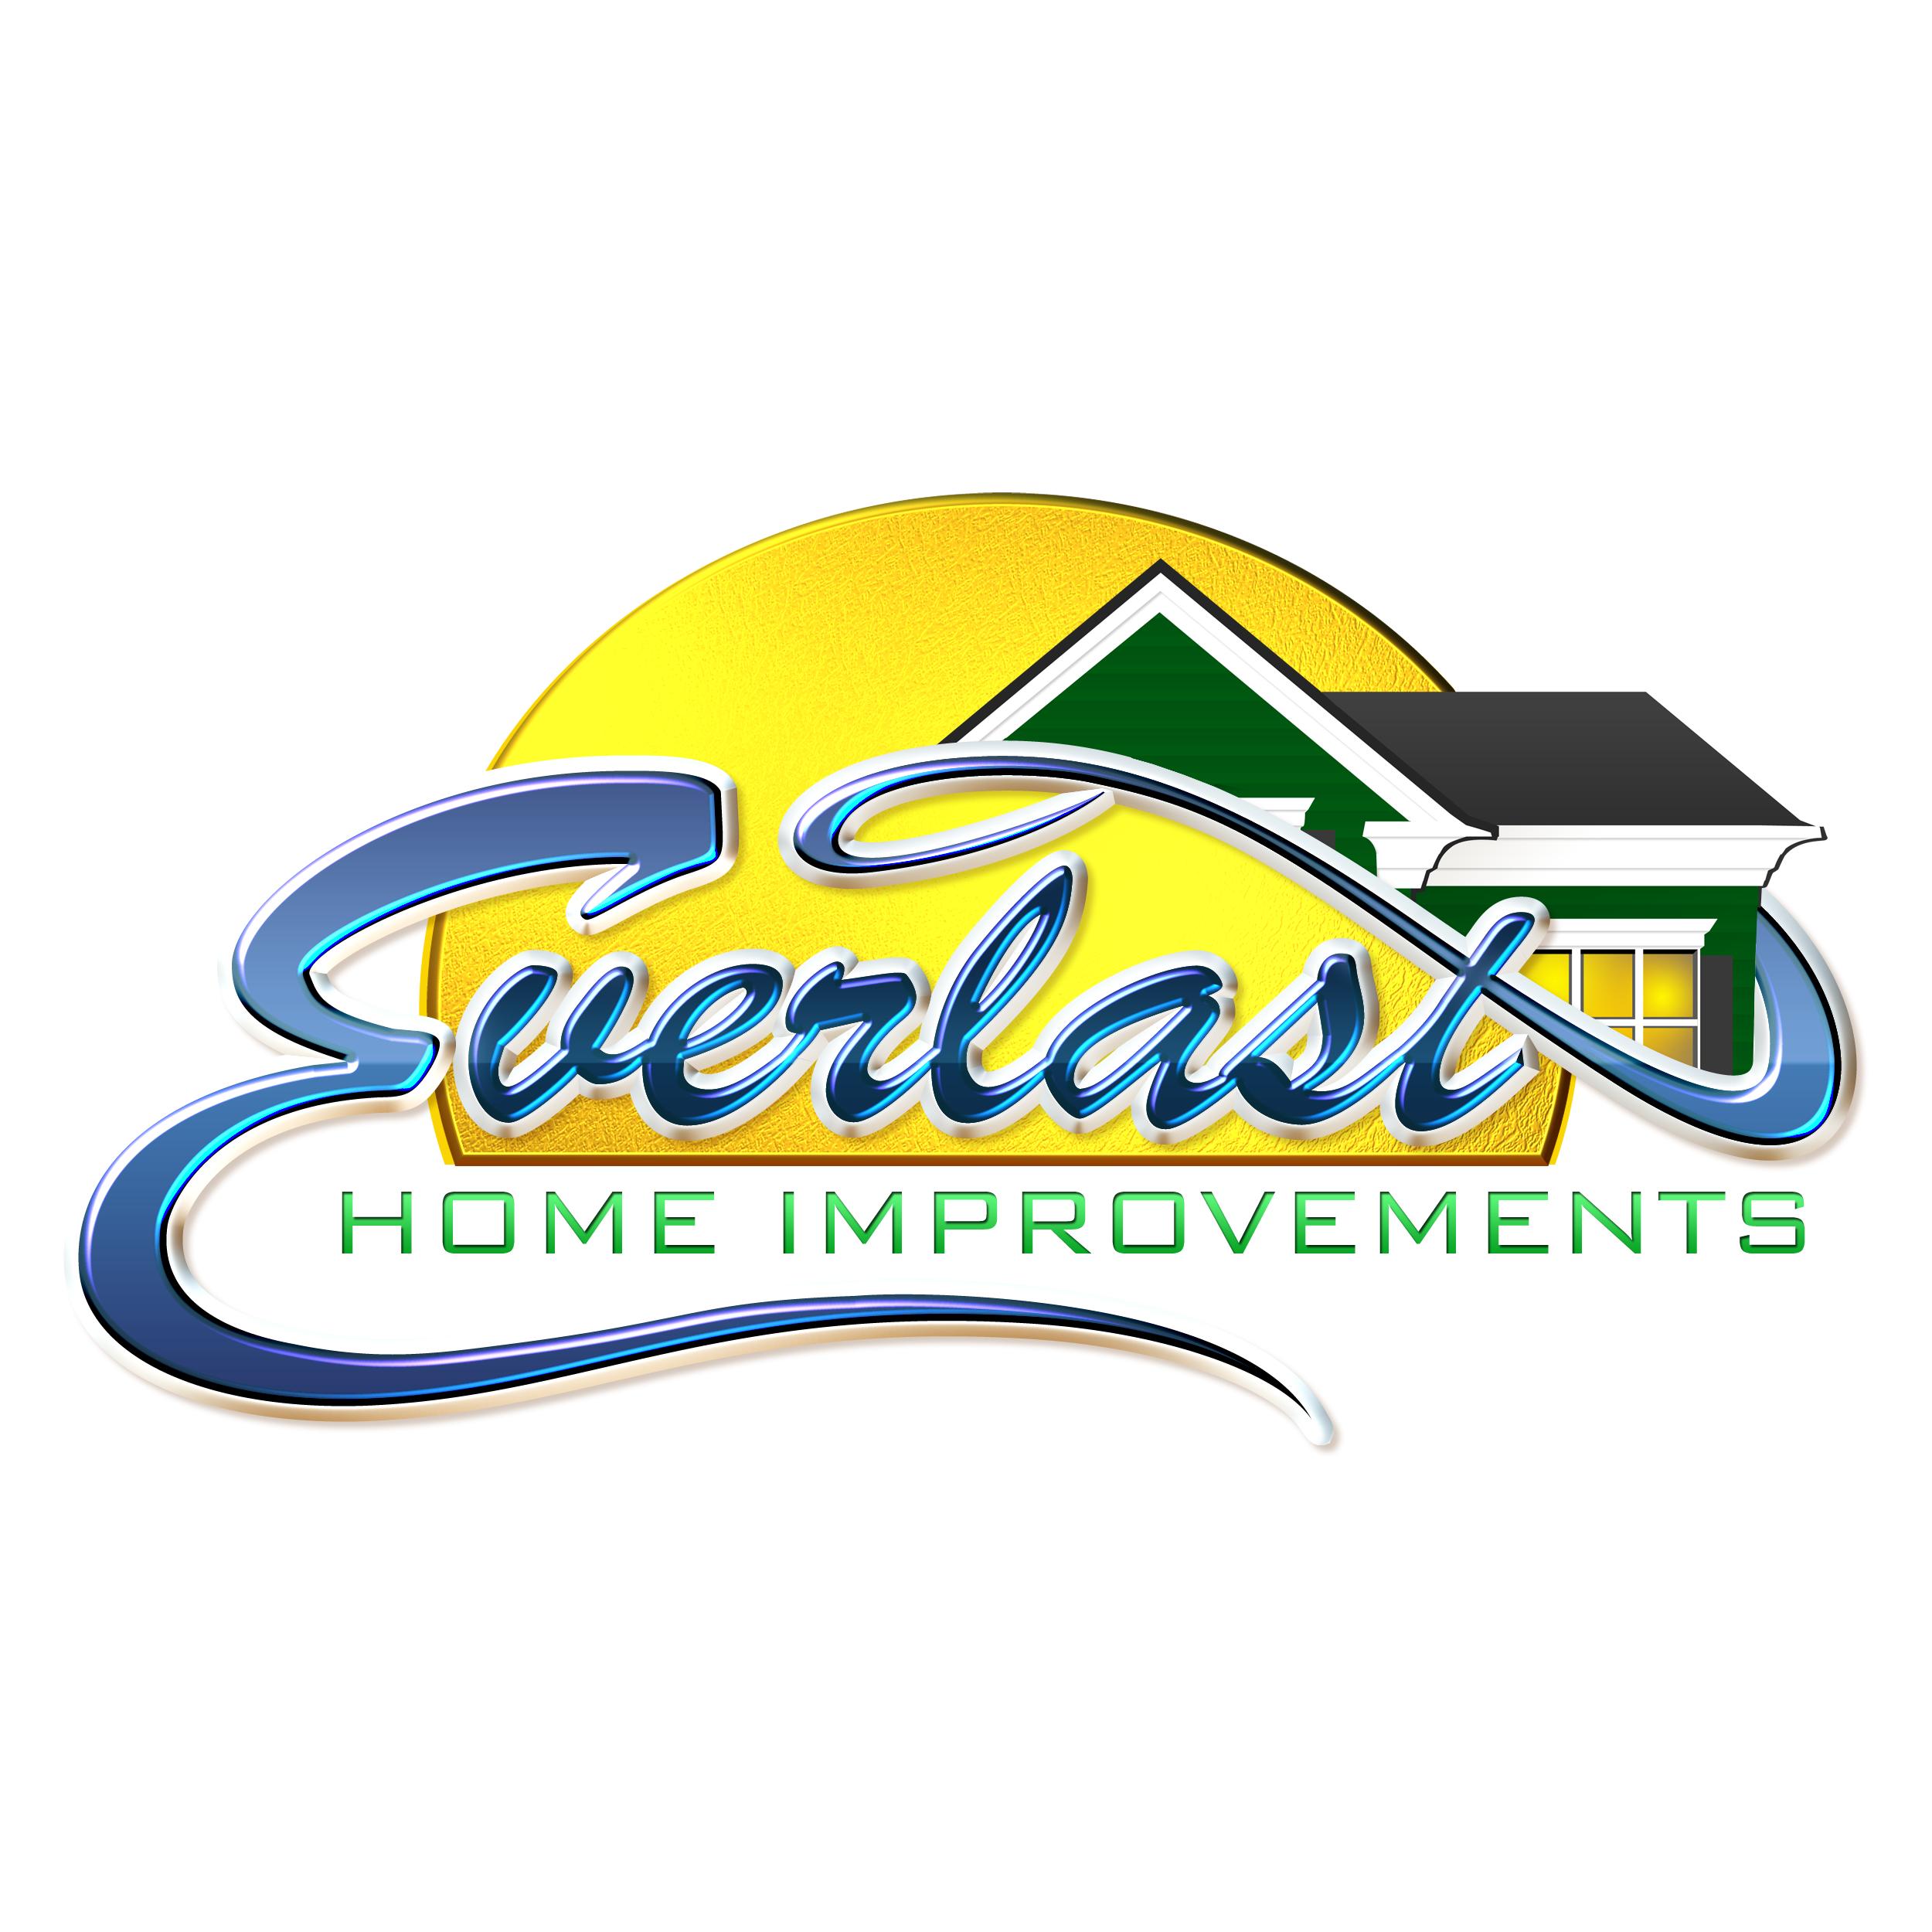 Everlast Home Improvements